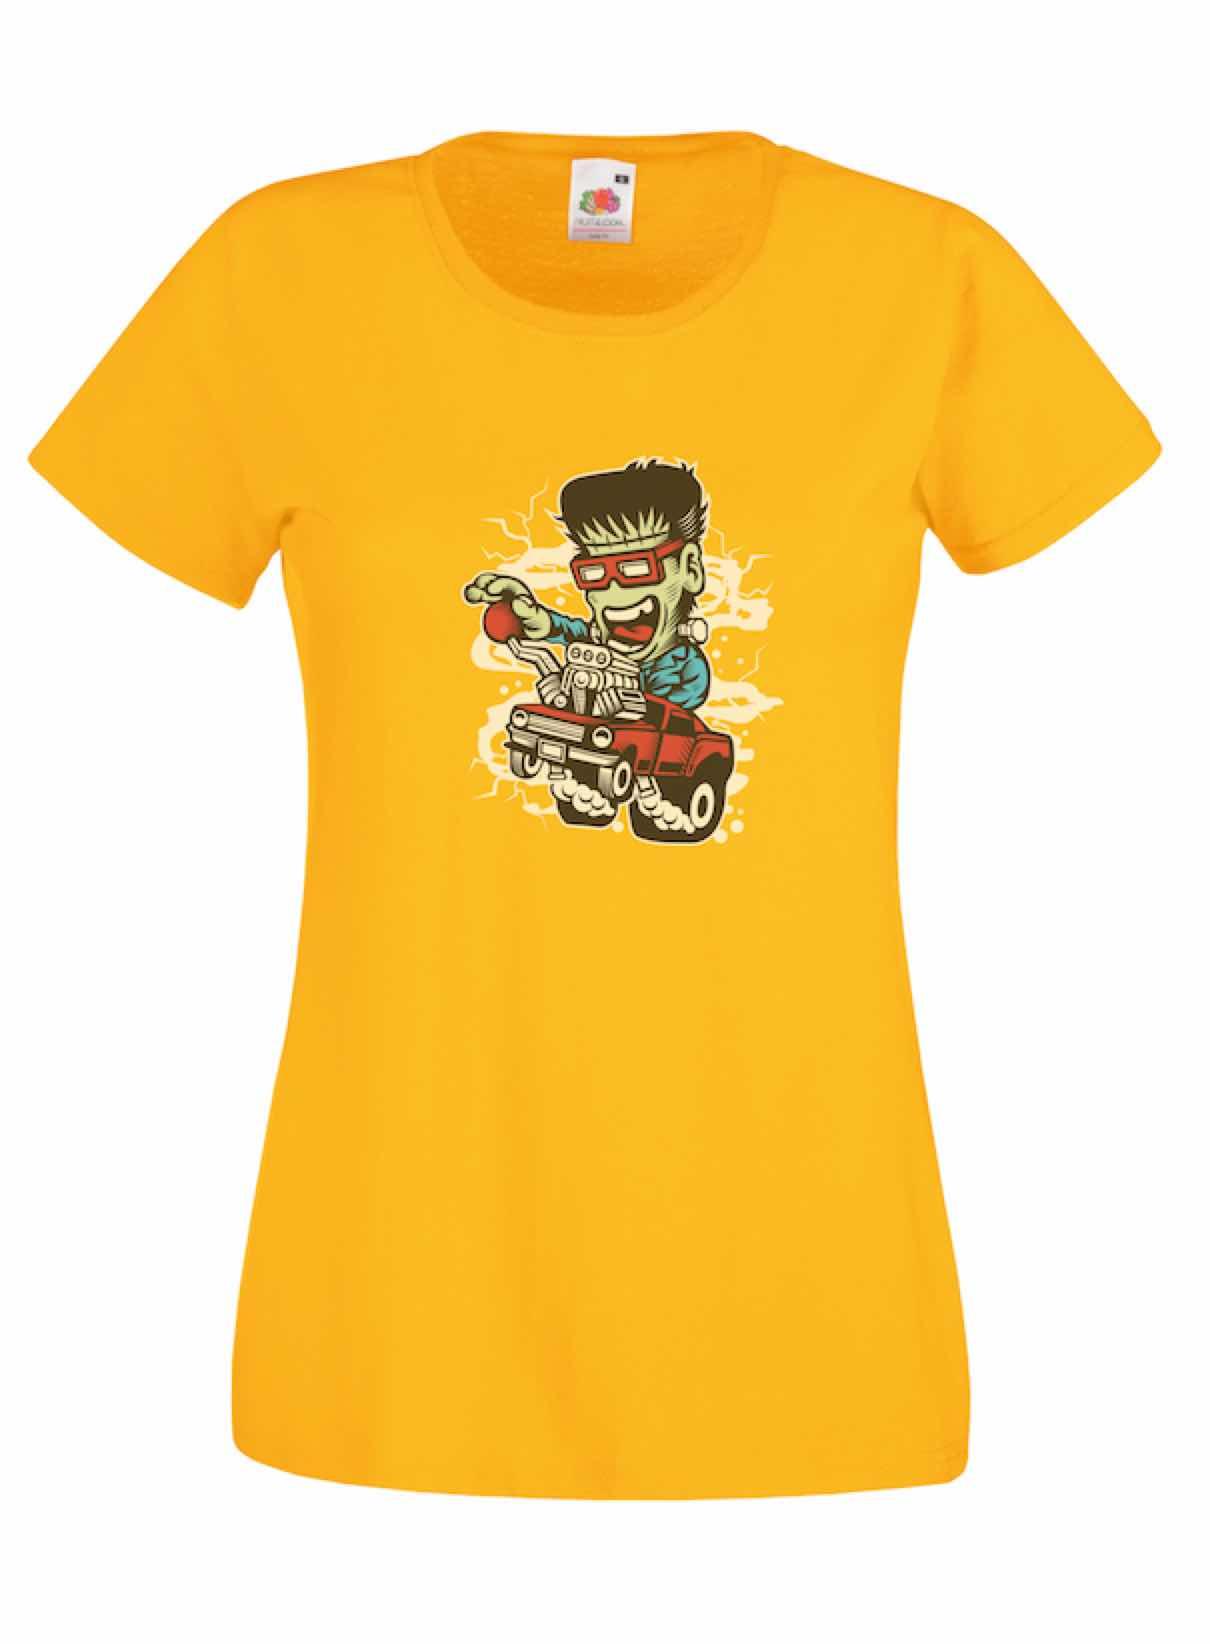 Frankenstein design for t-shirt, hoodie & sweatshirt